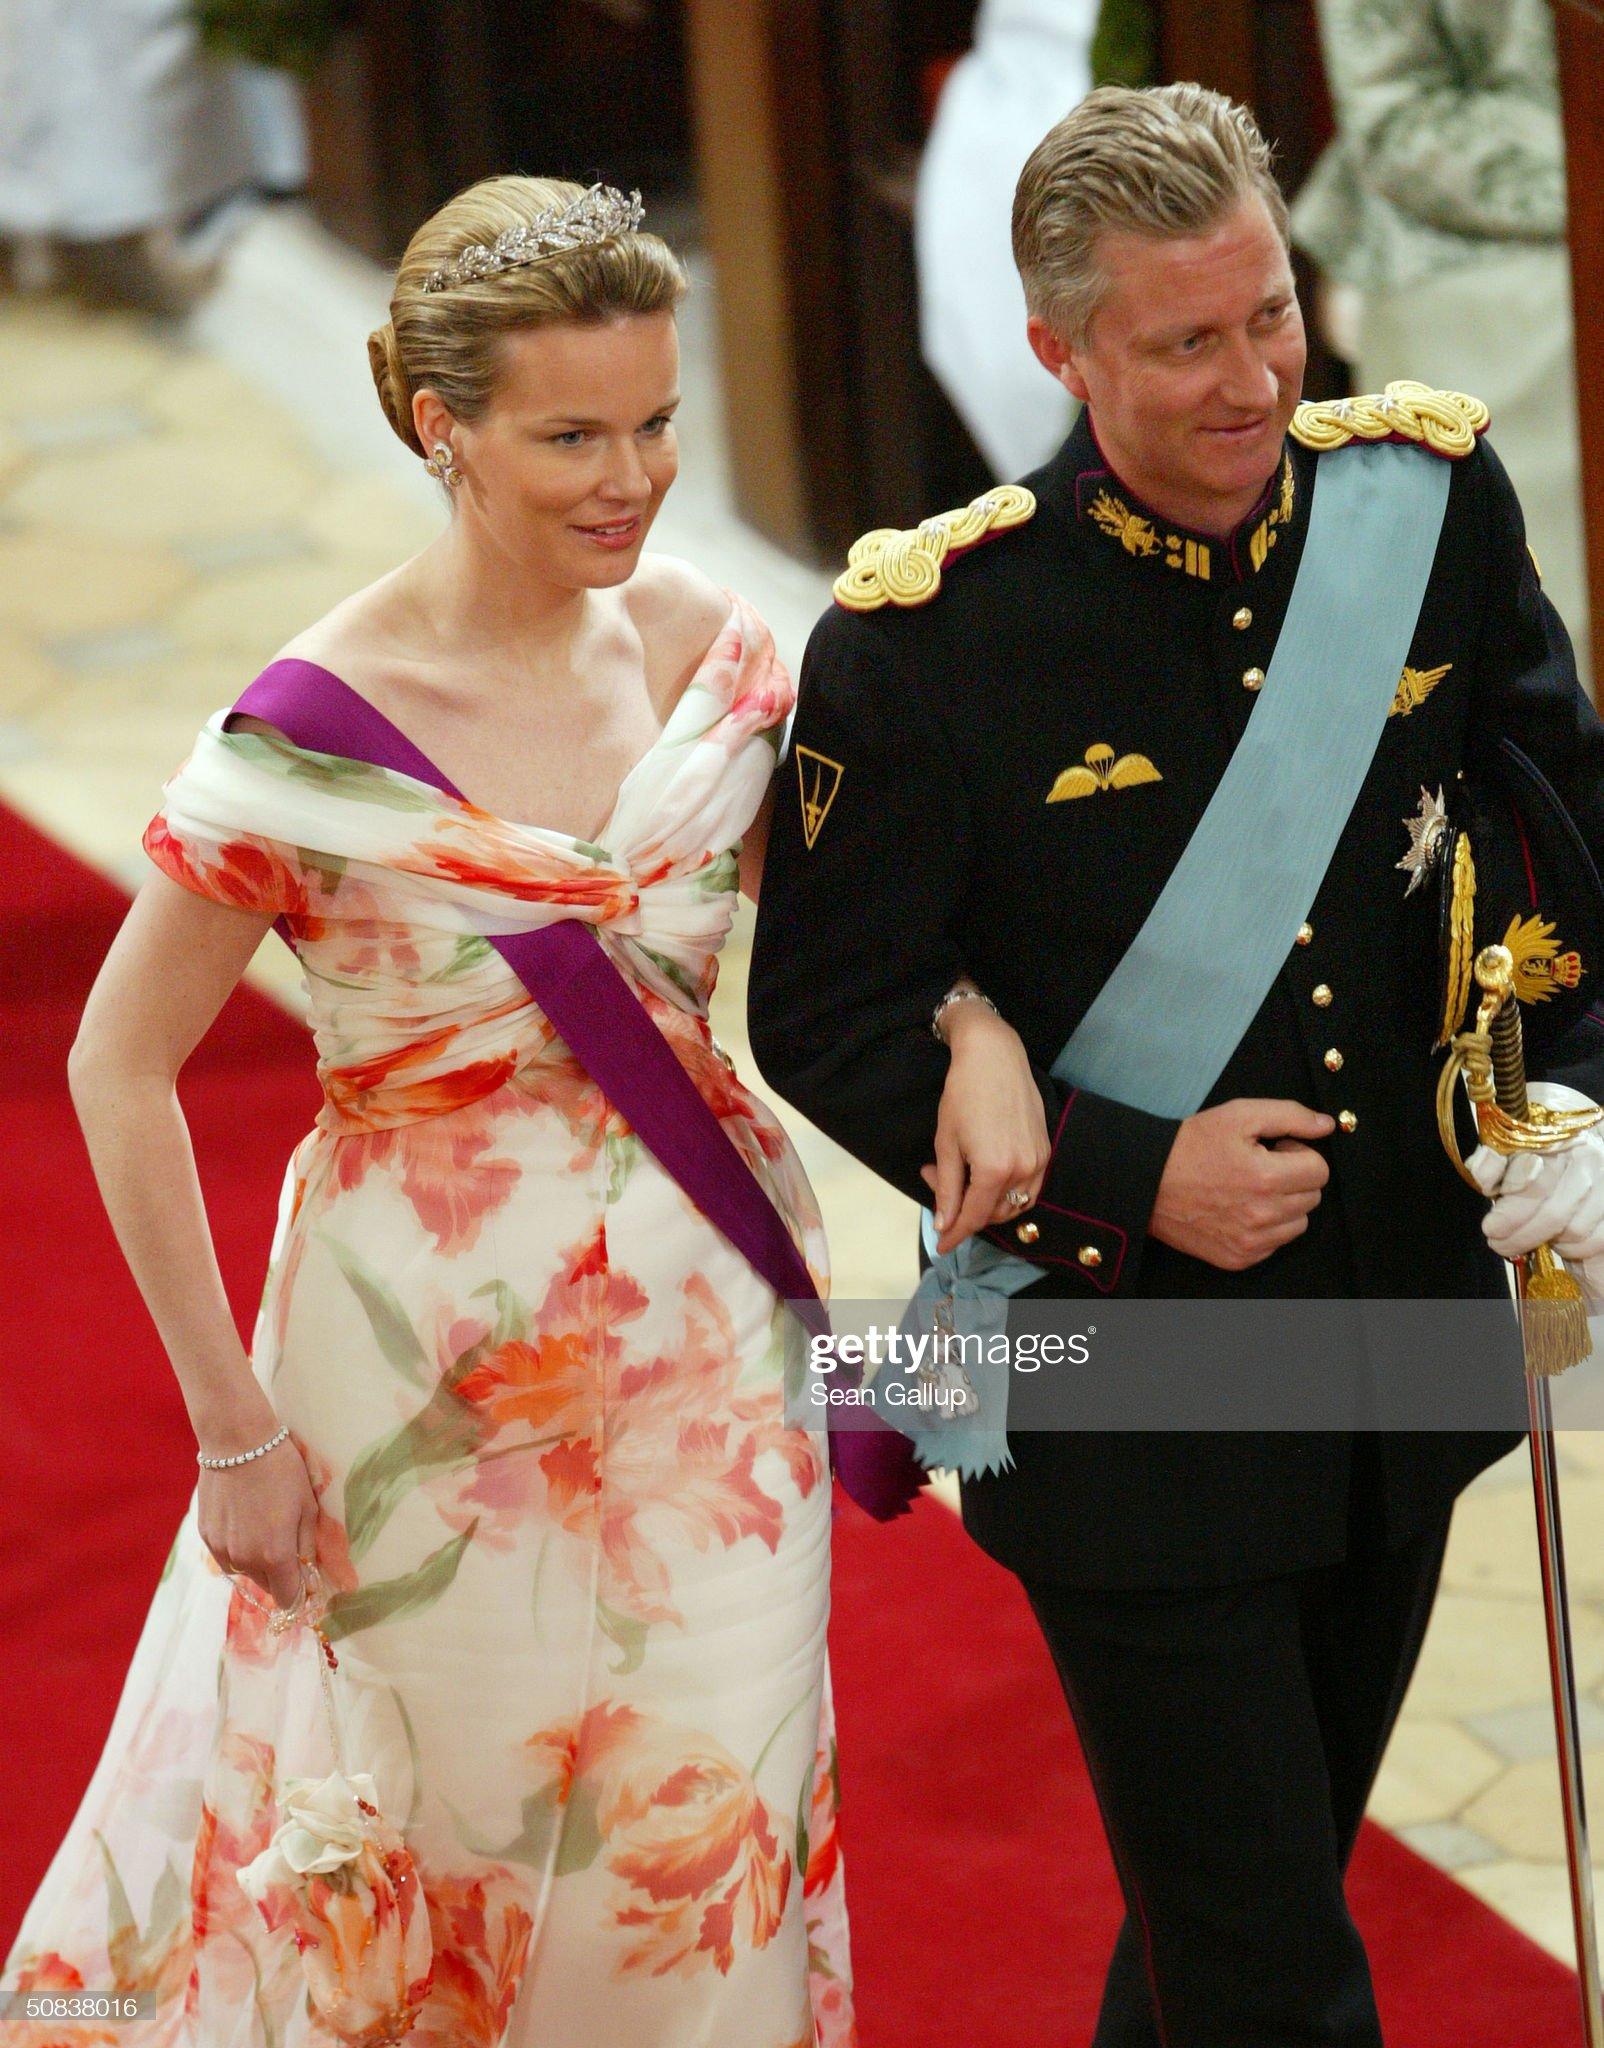 Вечерние наряды Королевы Матильды Wedding Of Danish Crown Prince Frederik and Mary Donaldson : News Photo